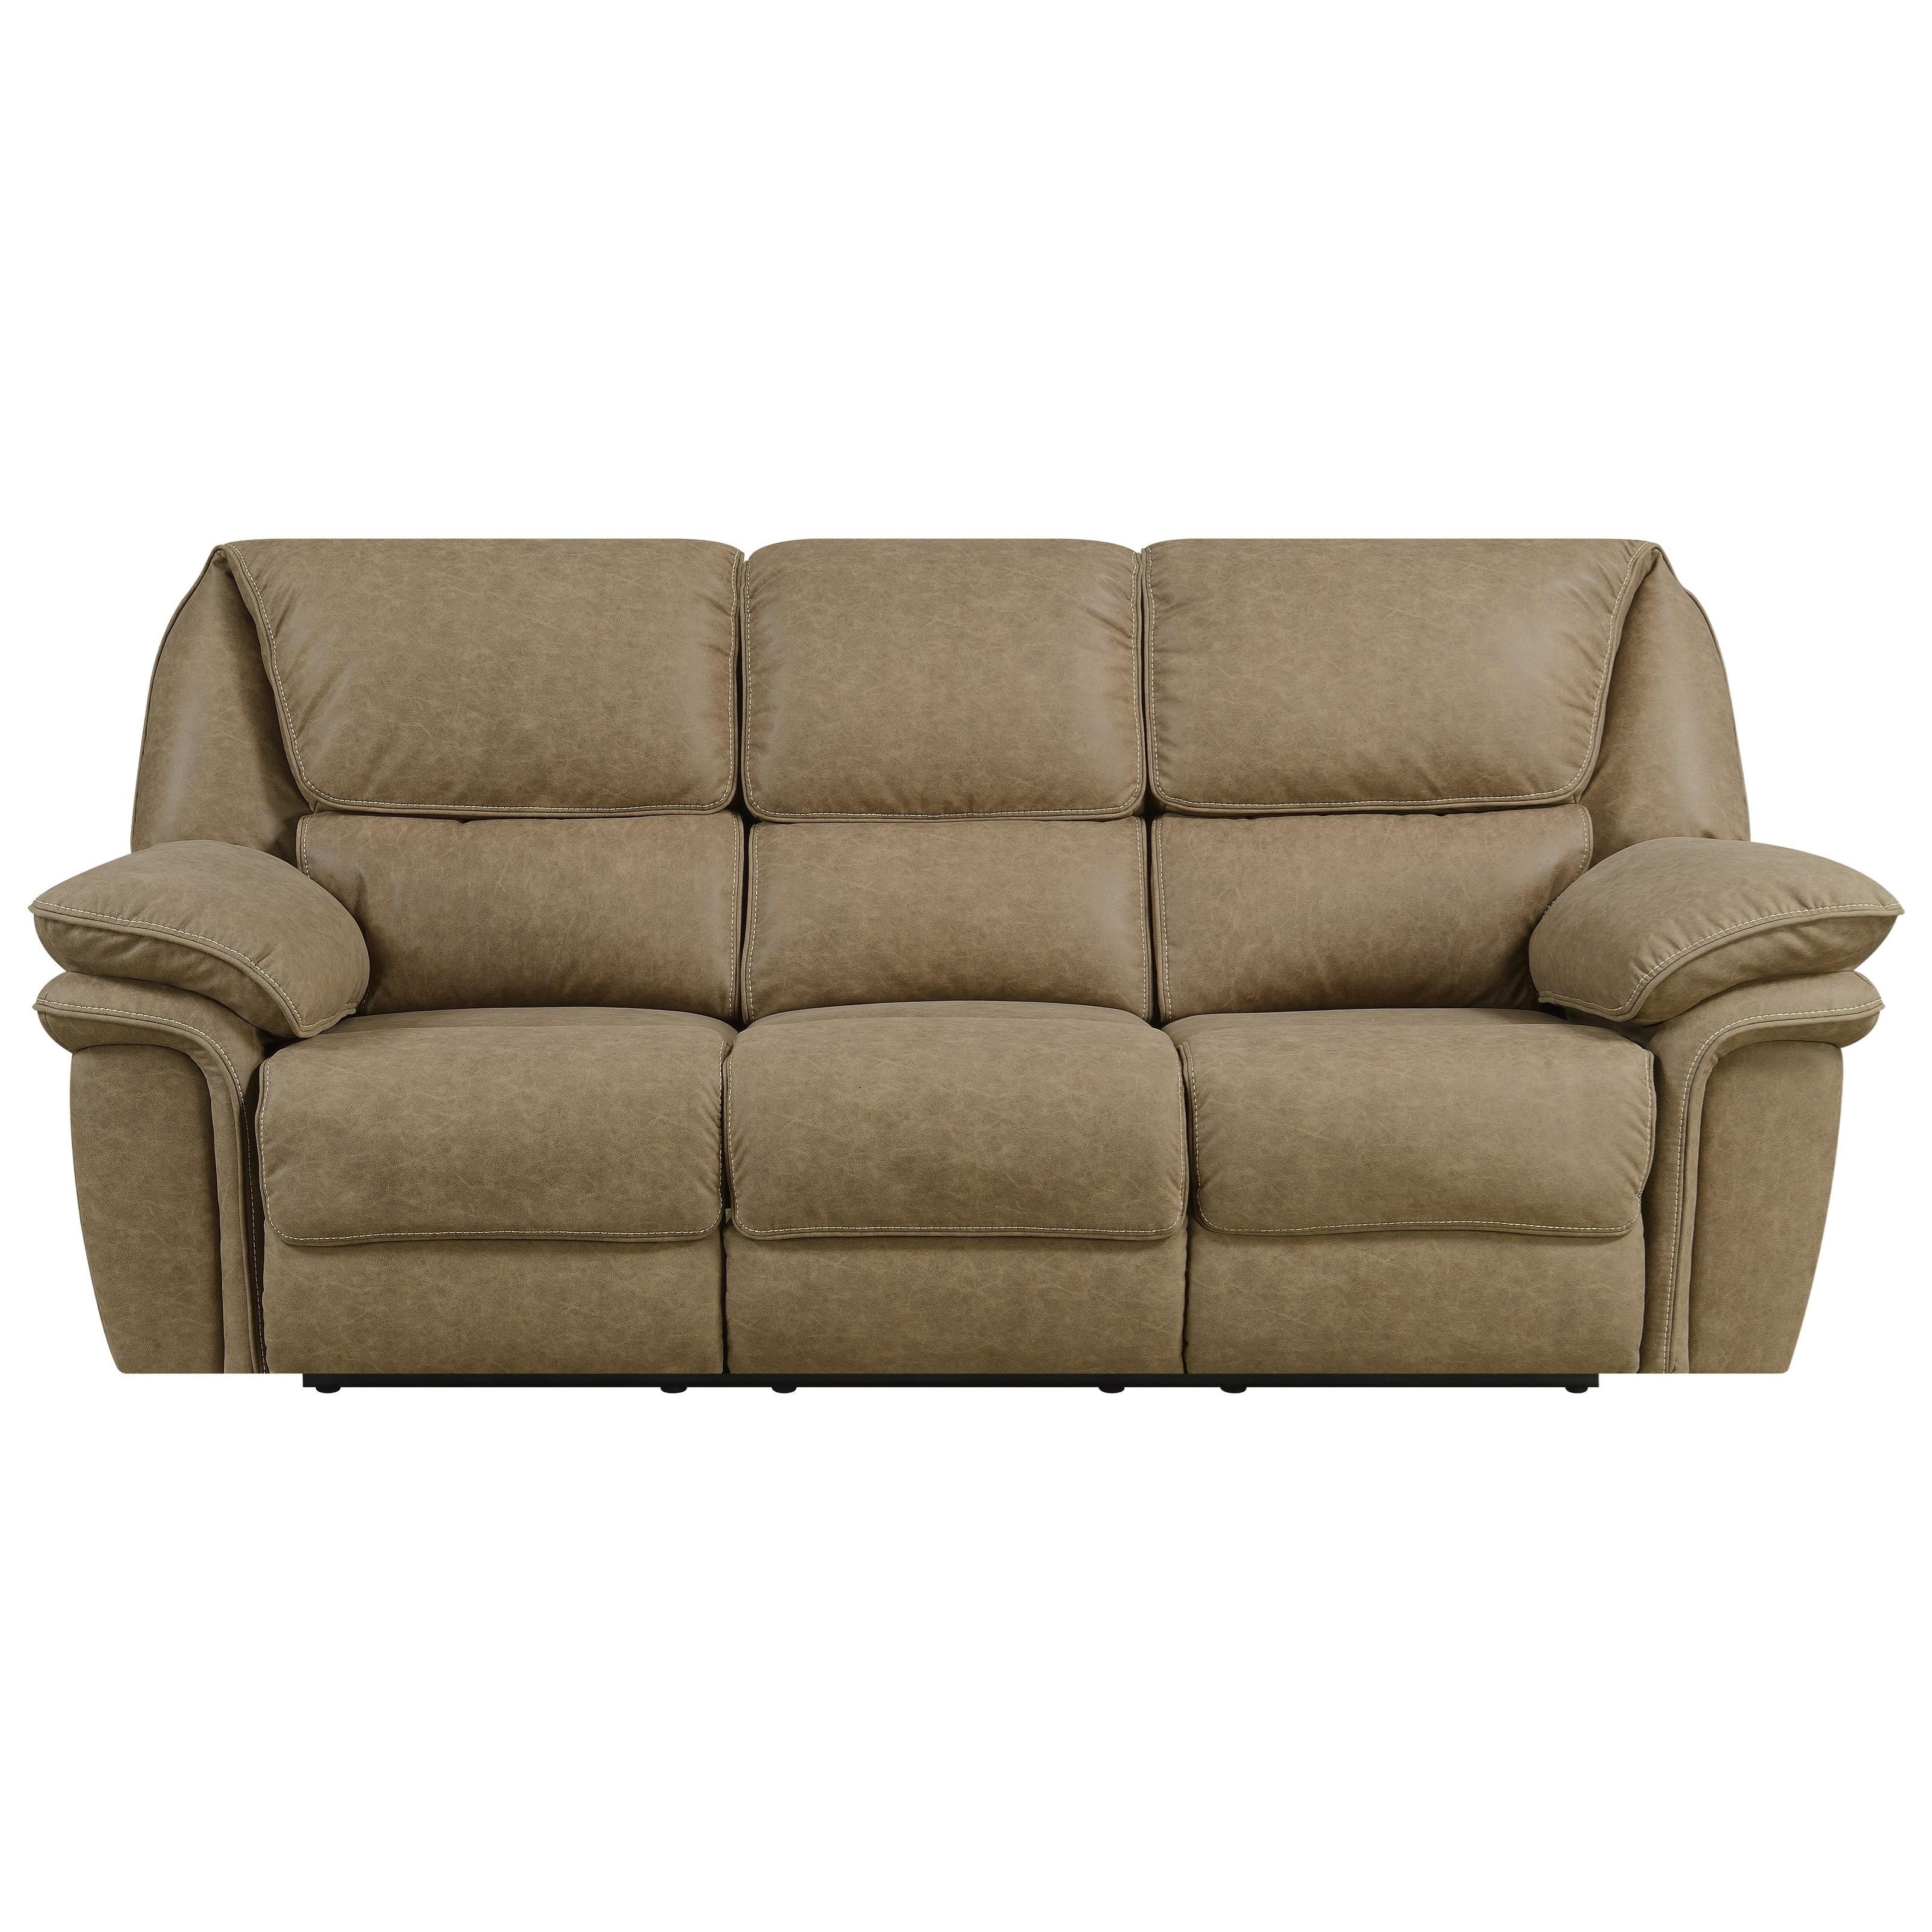 Allyn Power Reclining Sofa by Emerald at Suburban Furniture